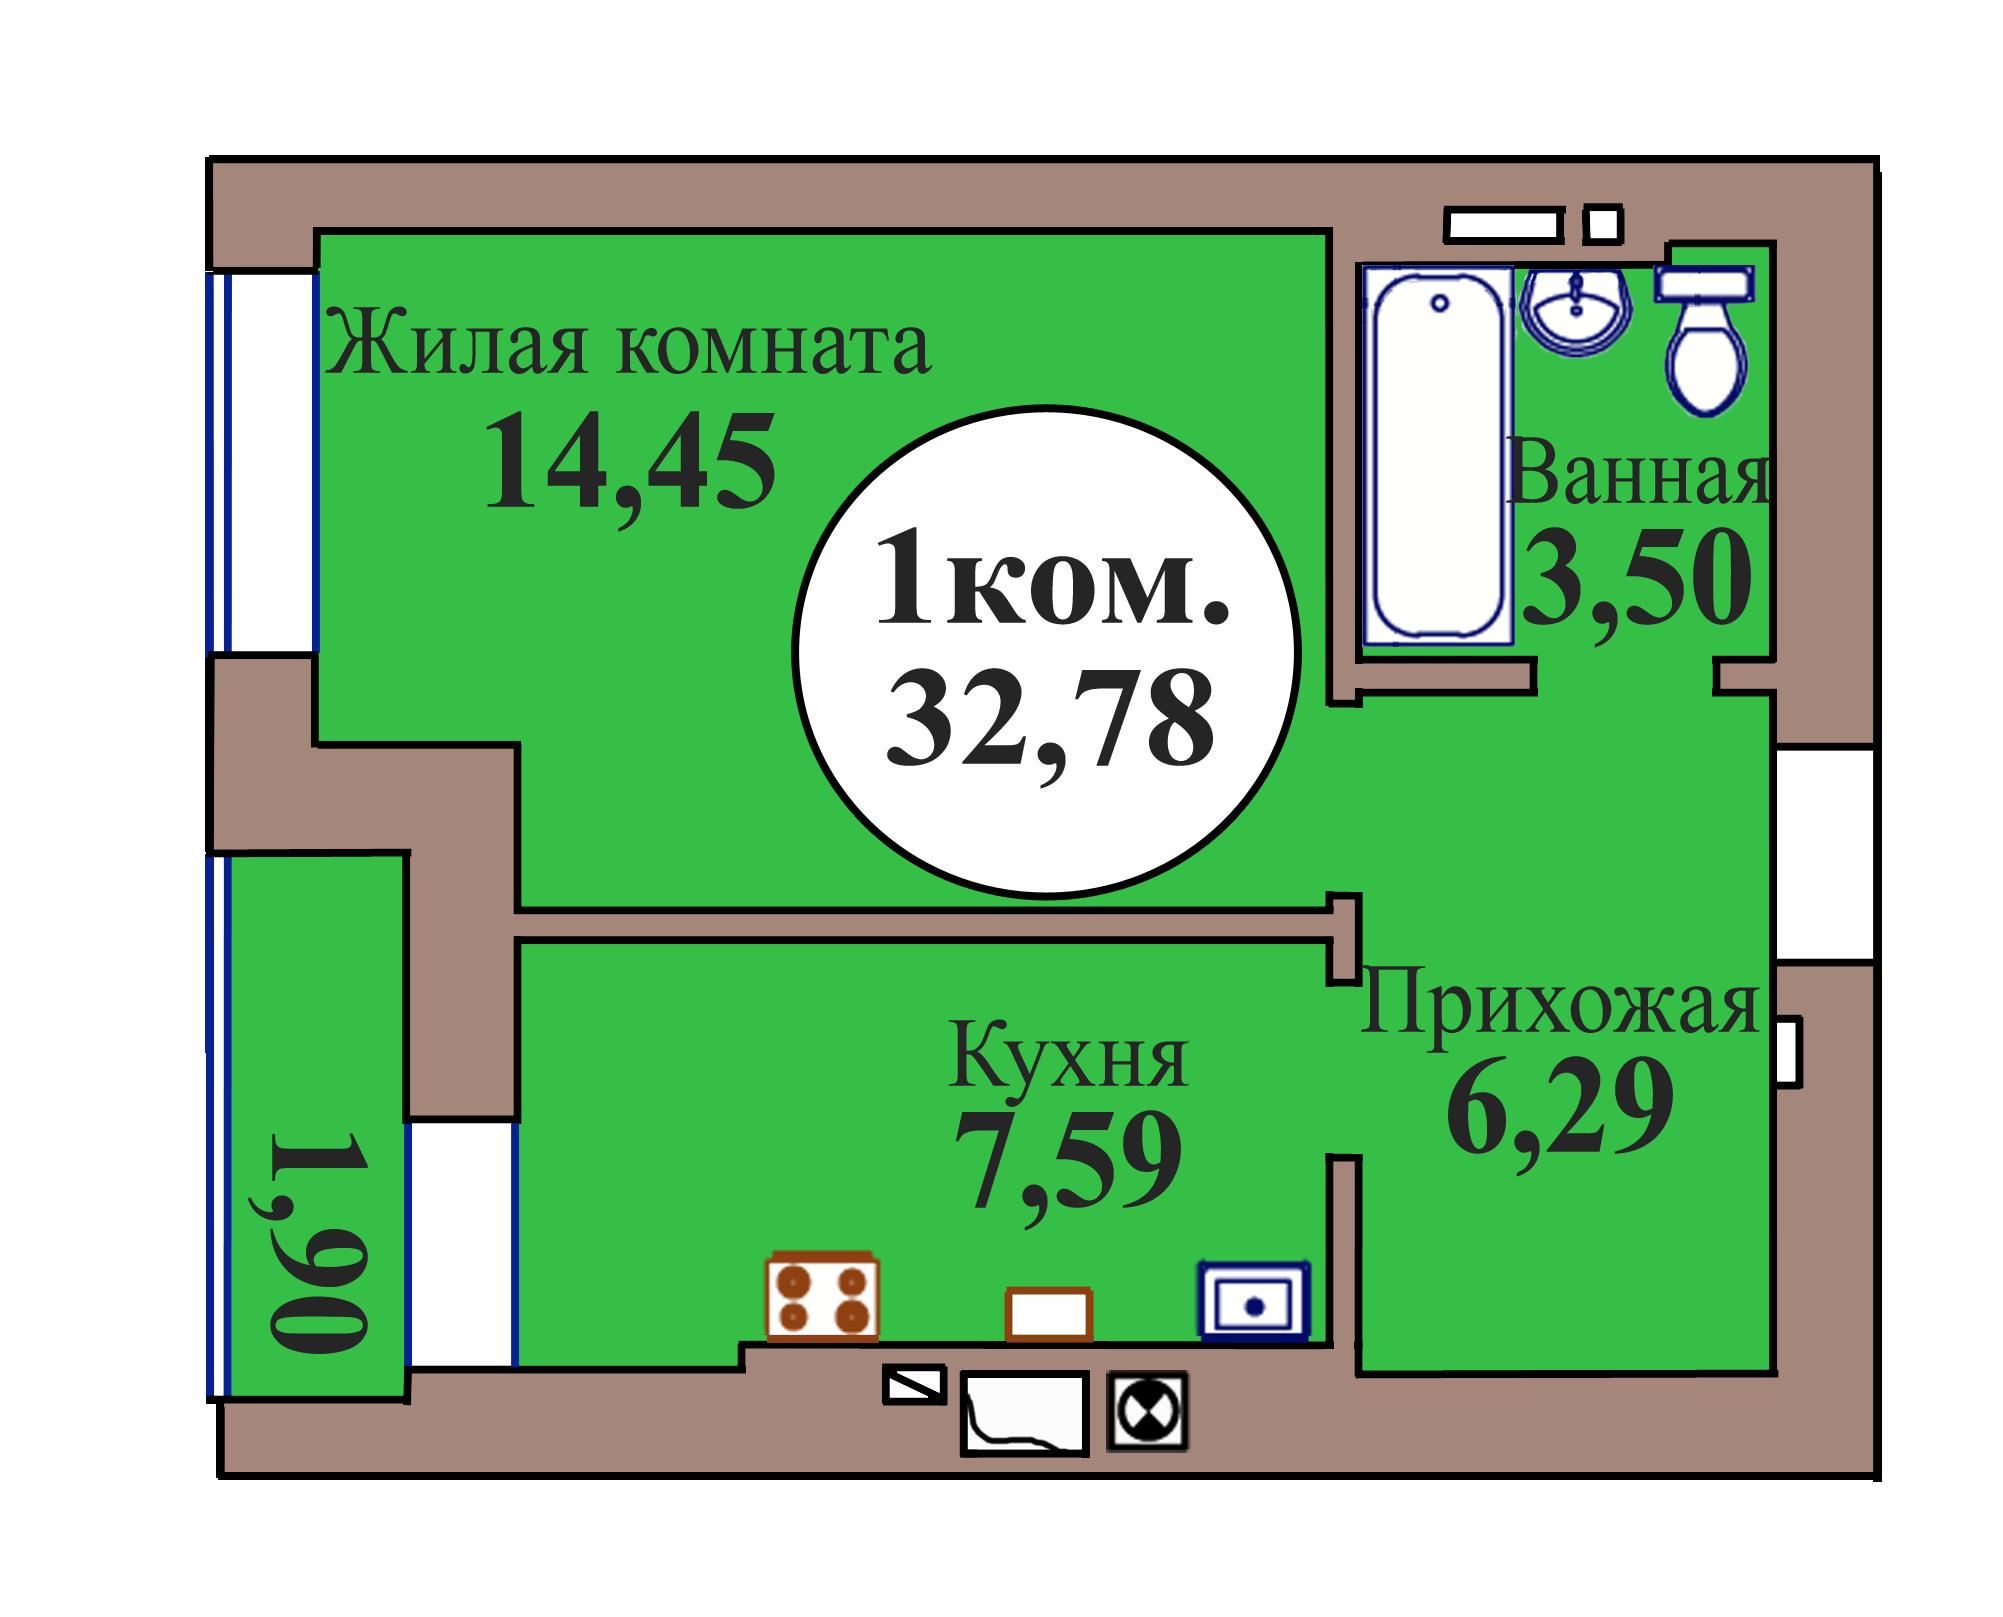 1-комн. кв. по пер. Калининградский, 5 кв. 83 в Калининграде